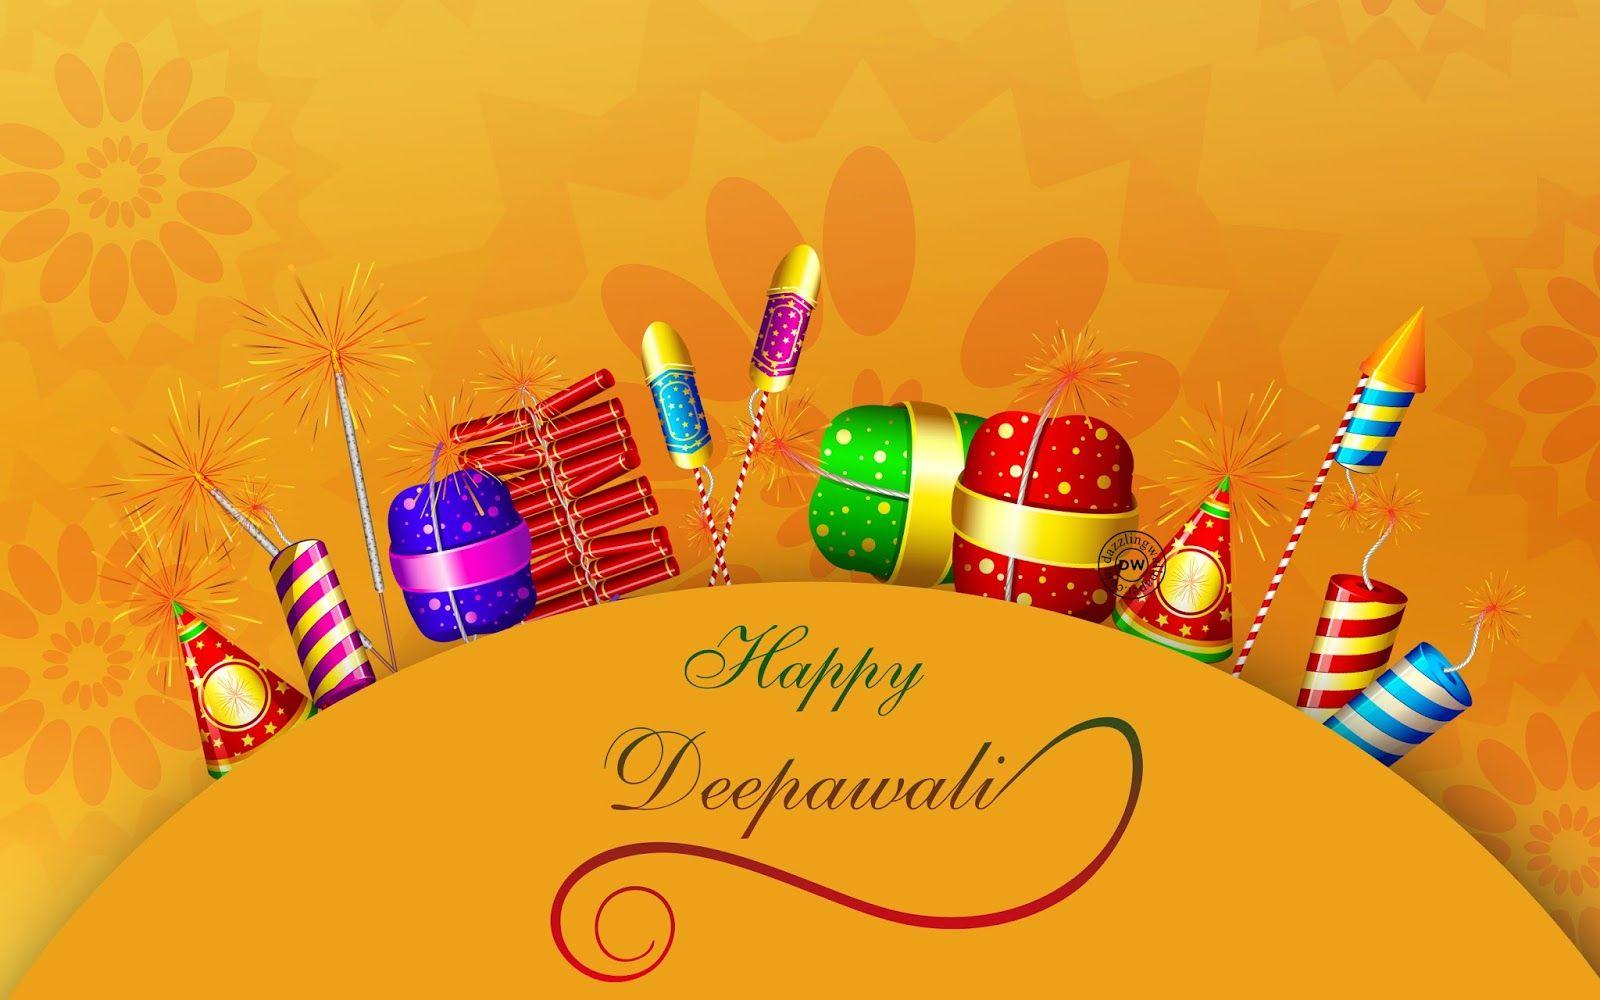 140 Word Diwali Sms In Hindi Diwali Wallpapers Pinterest Diwali